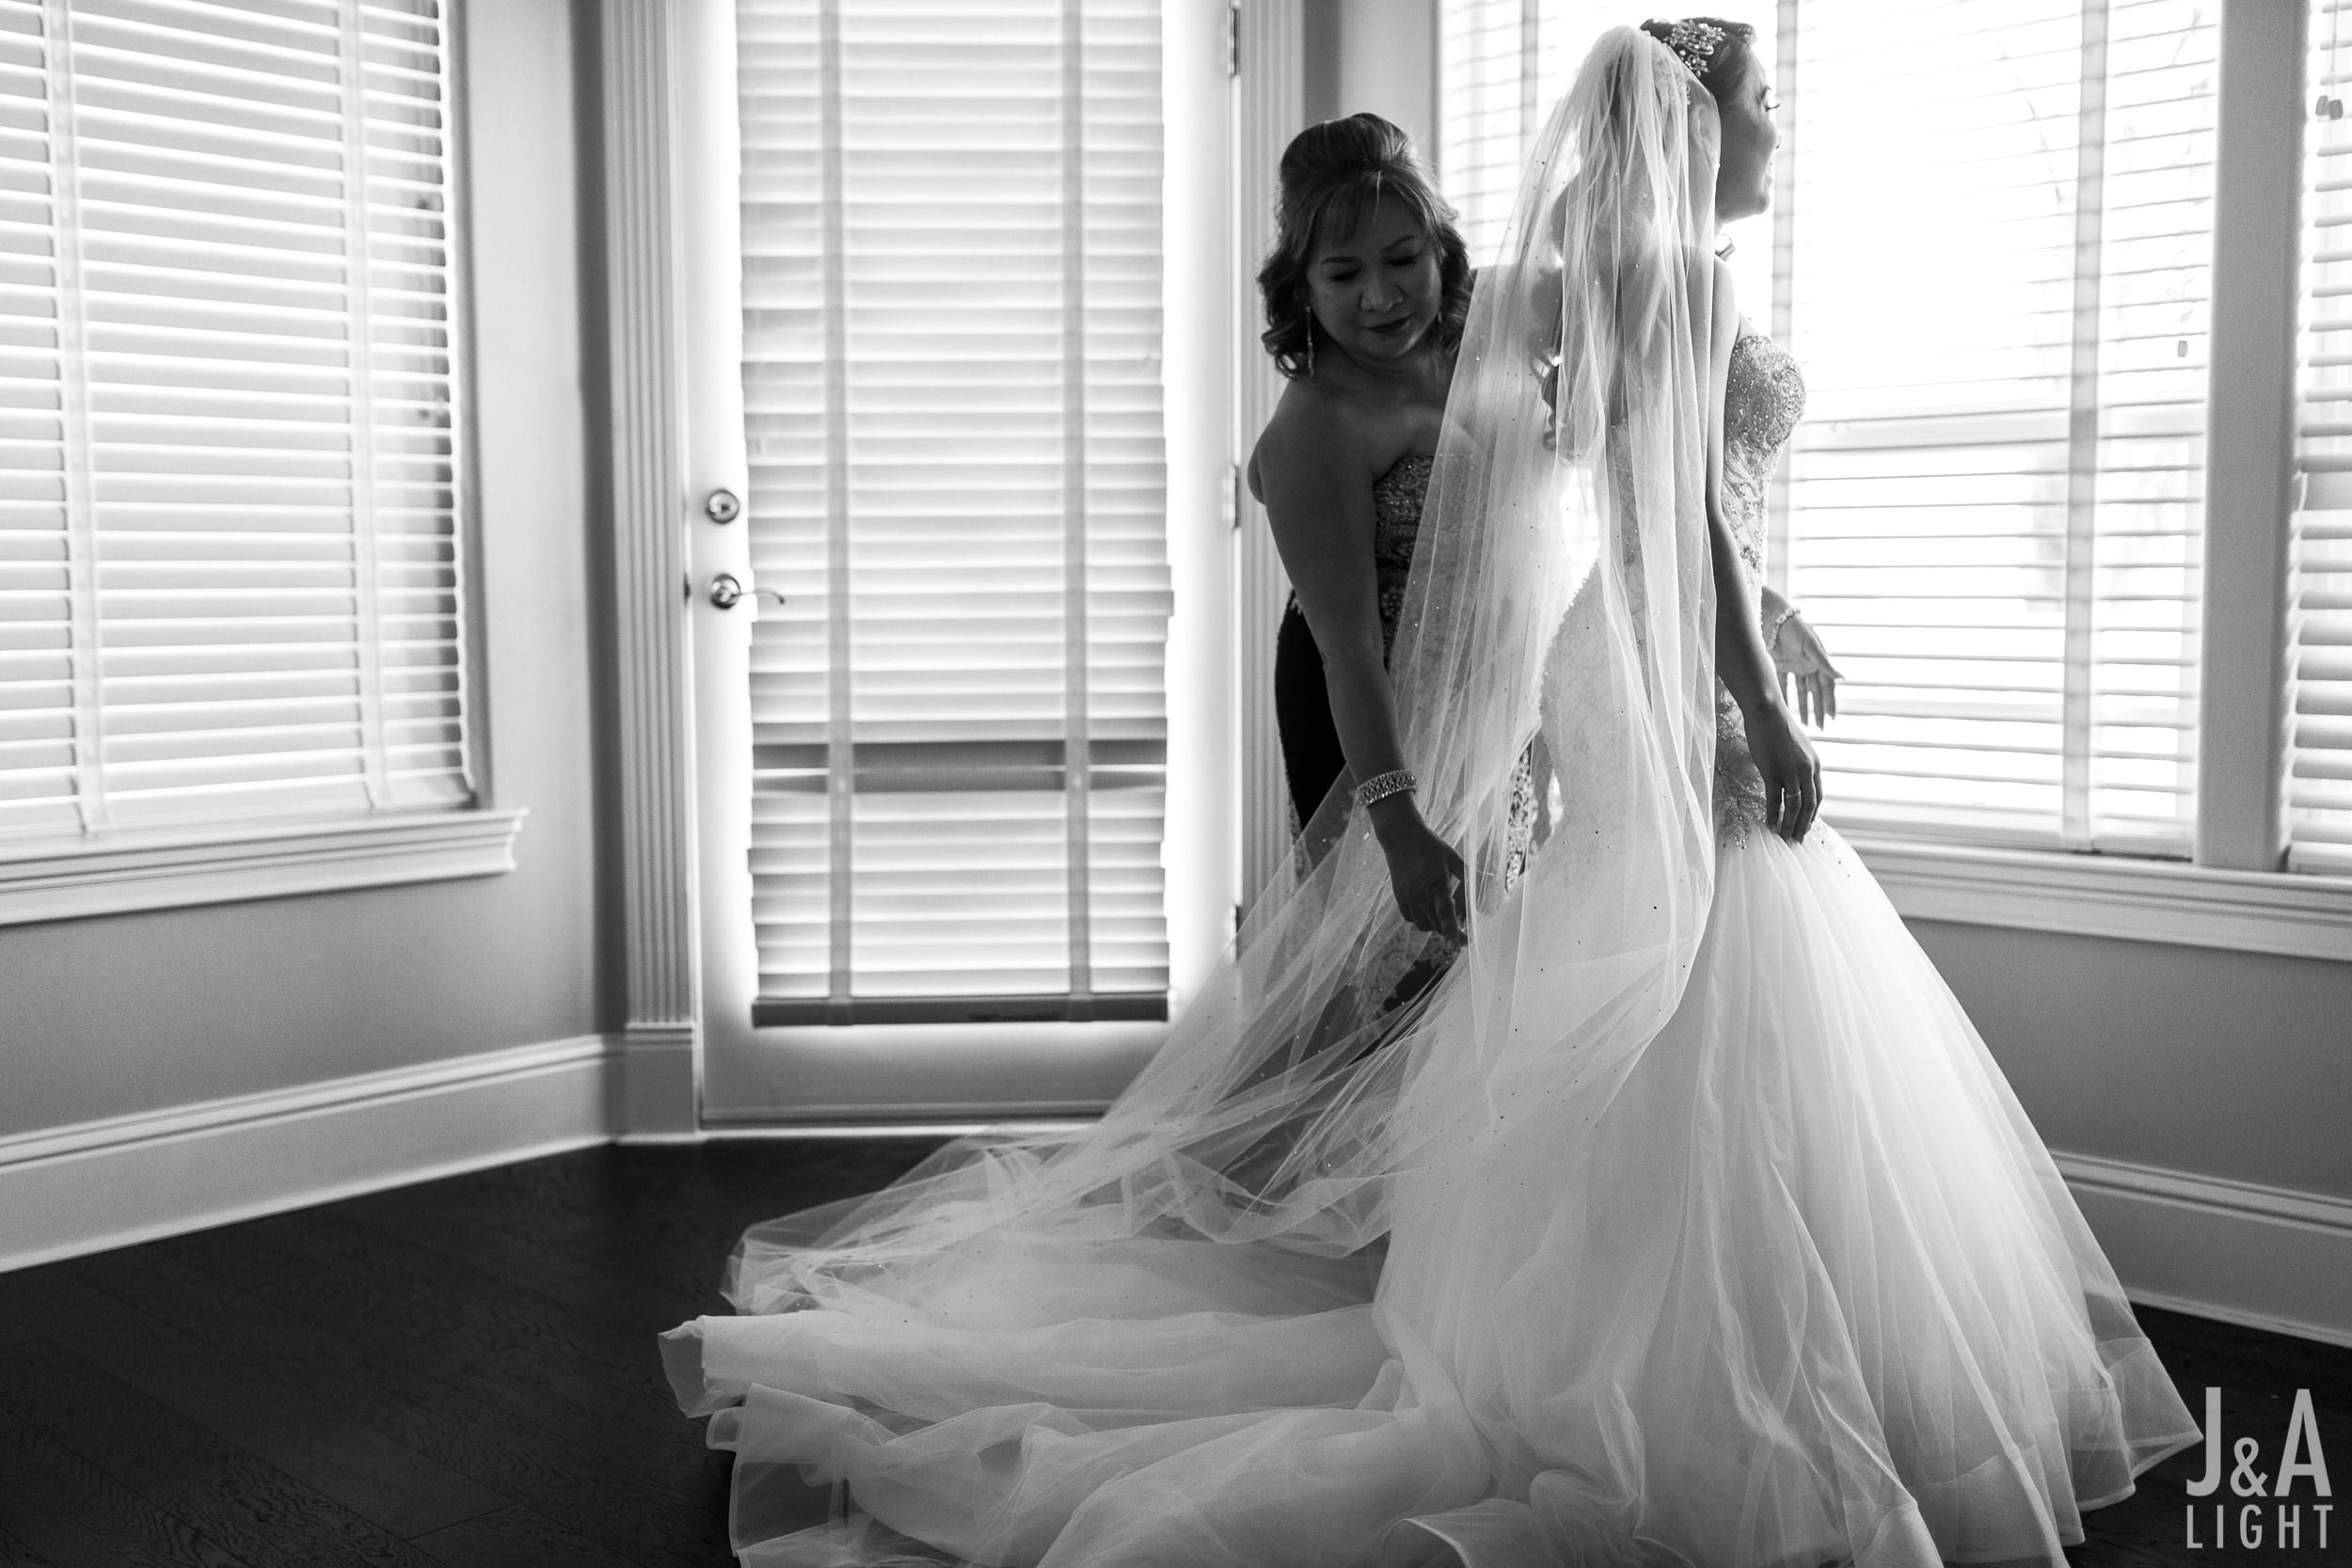 20171014-JanDan-LosBanos-GlassMansion-Wedding-Blog-015.jpg